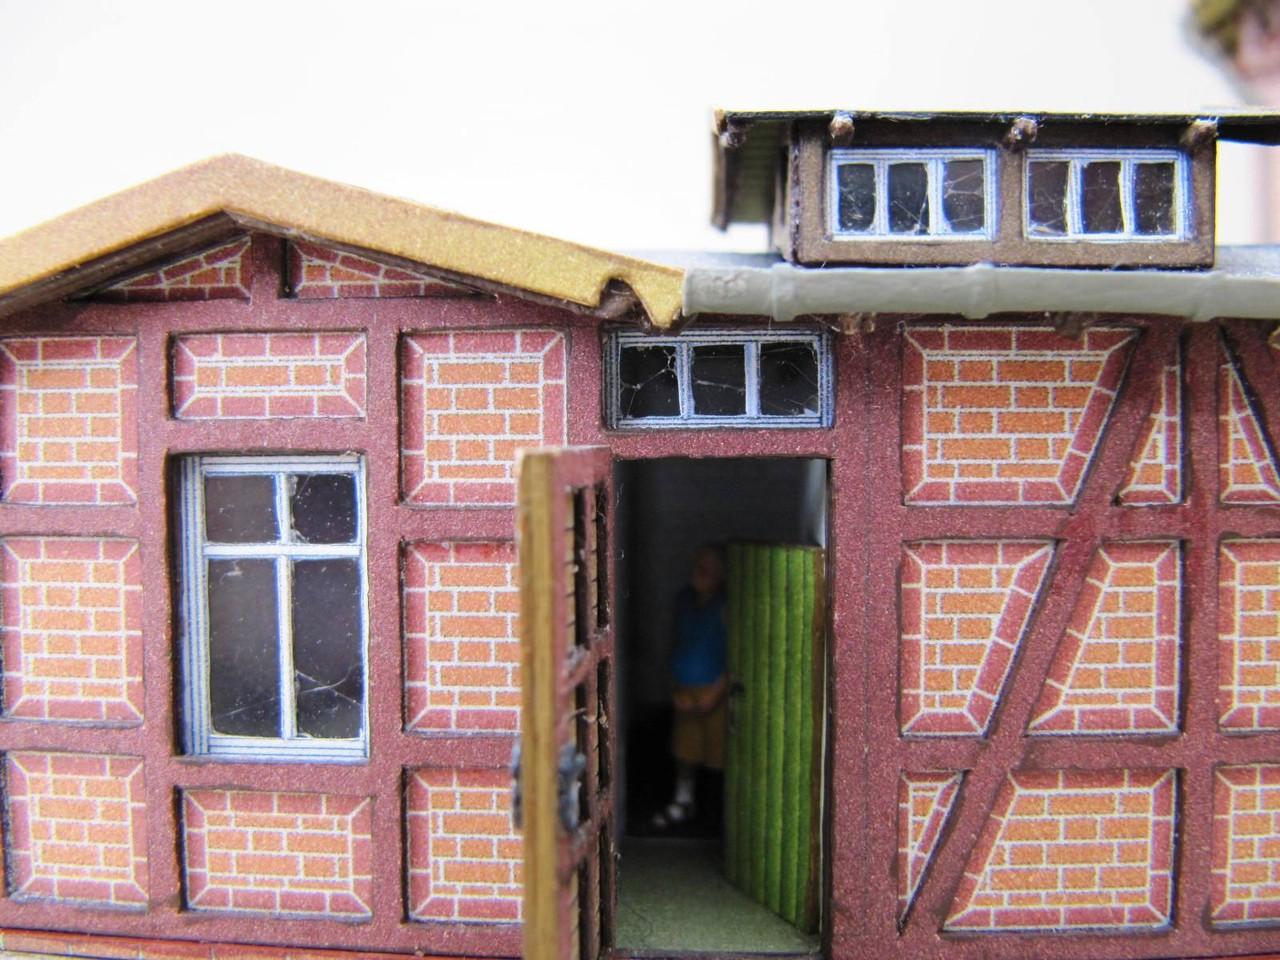 (c) W. Fehse - Haustür Nebengebäude 1:87 (H0)